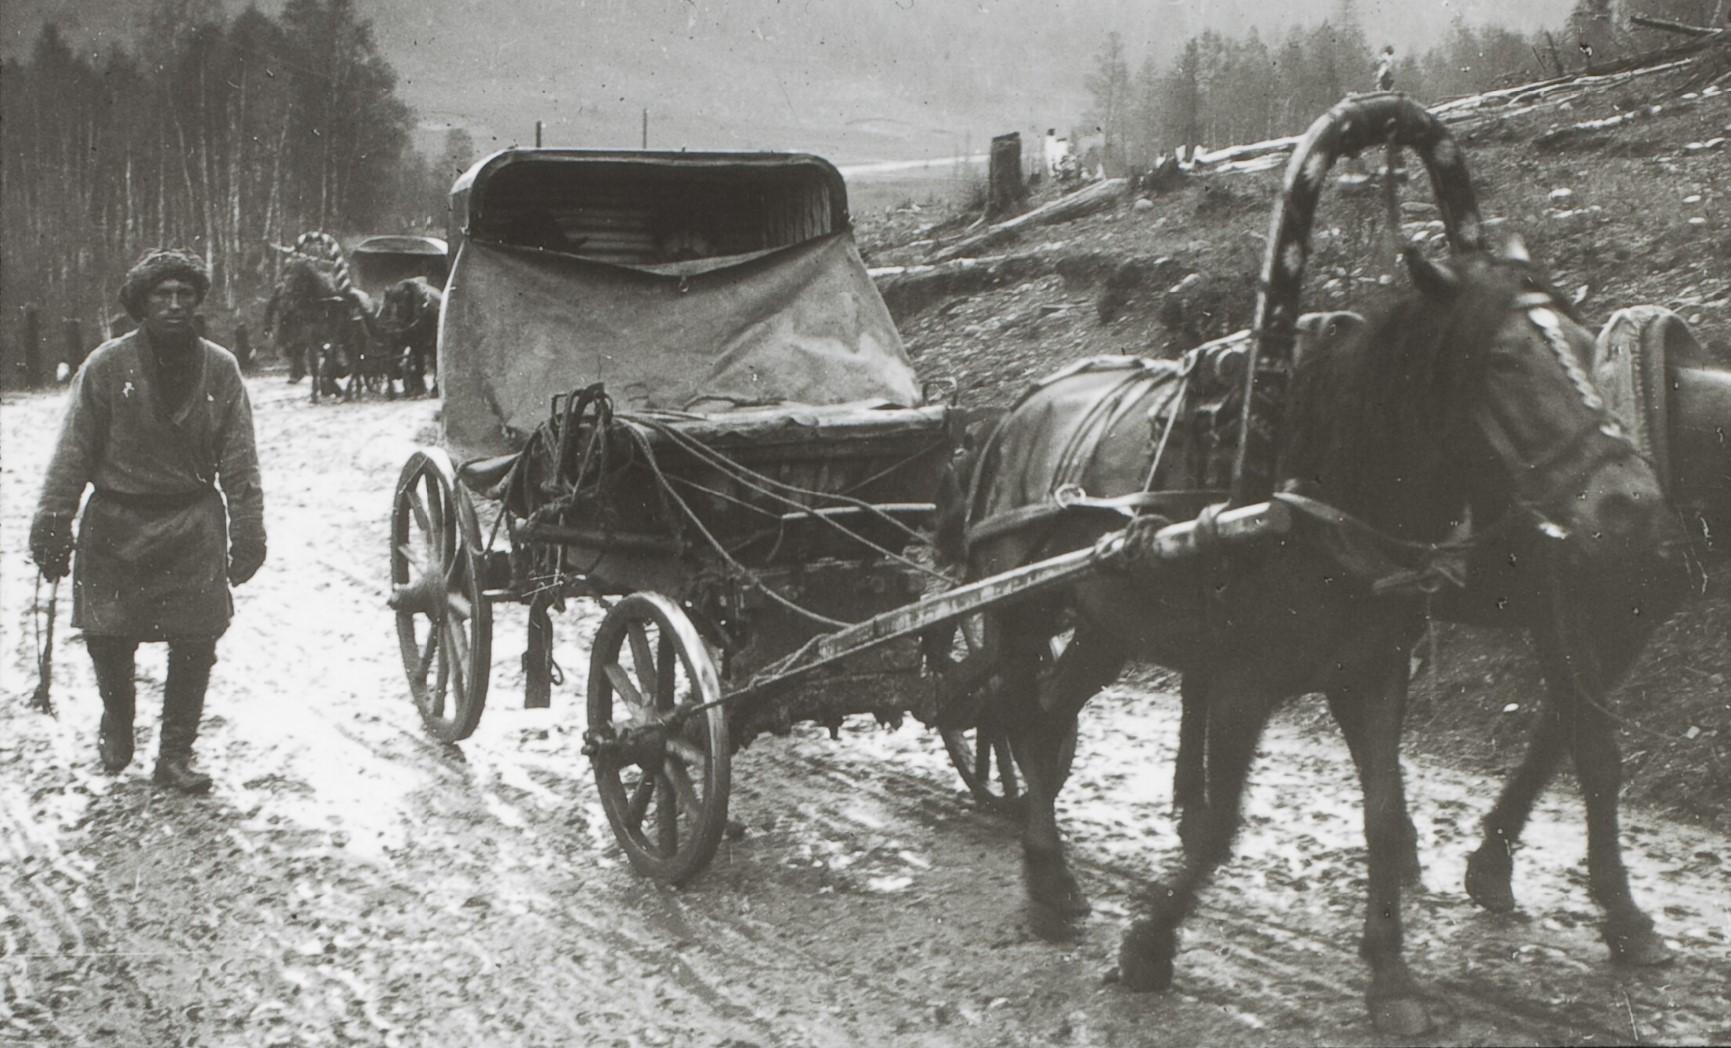 Якутская область. Лесная дорога в Якутских горах. Тарантас.